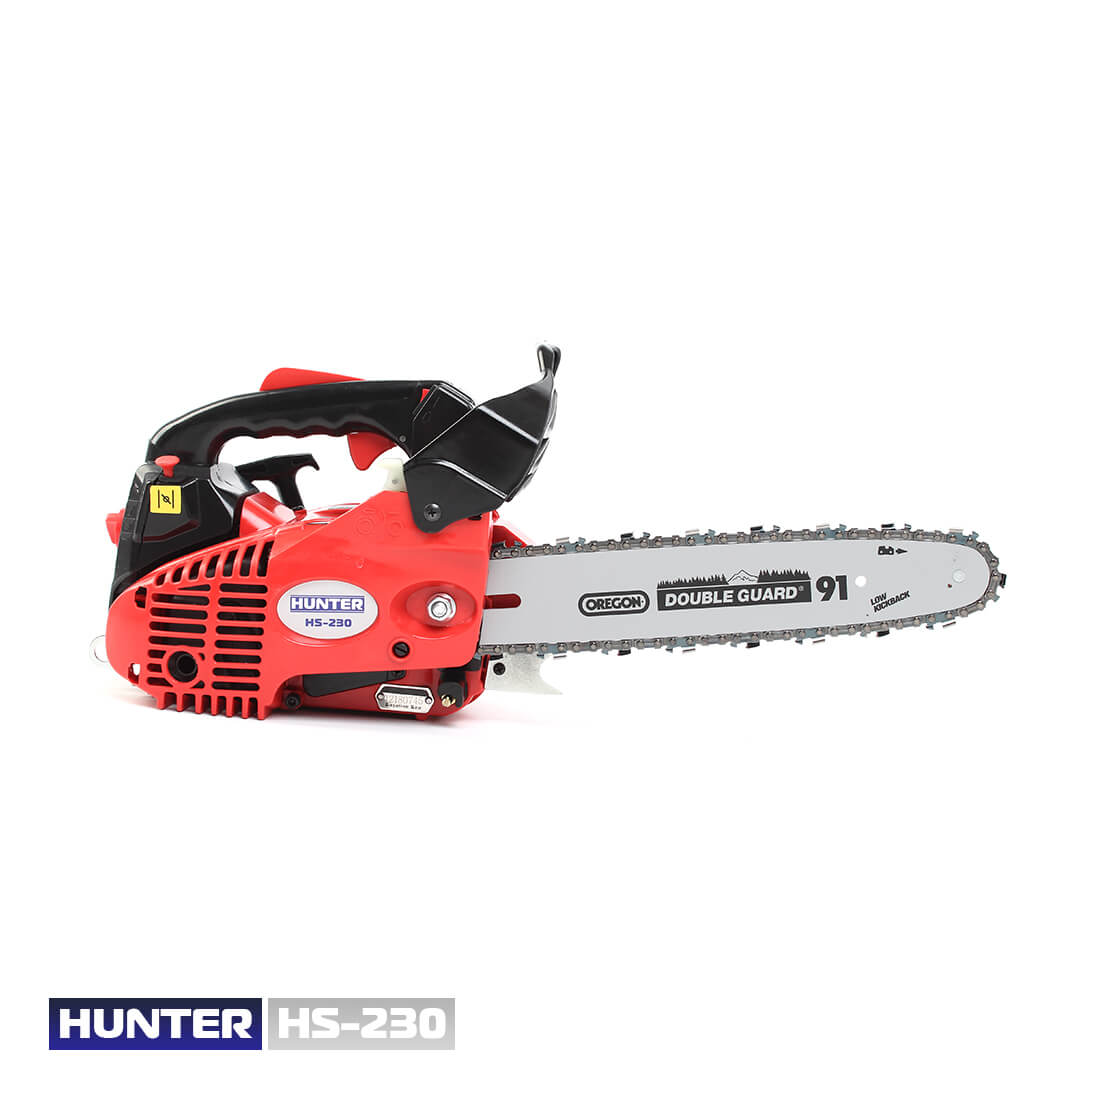 Фото Hunter HS-230 цена 3470грн №2 — Hunter